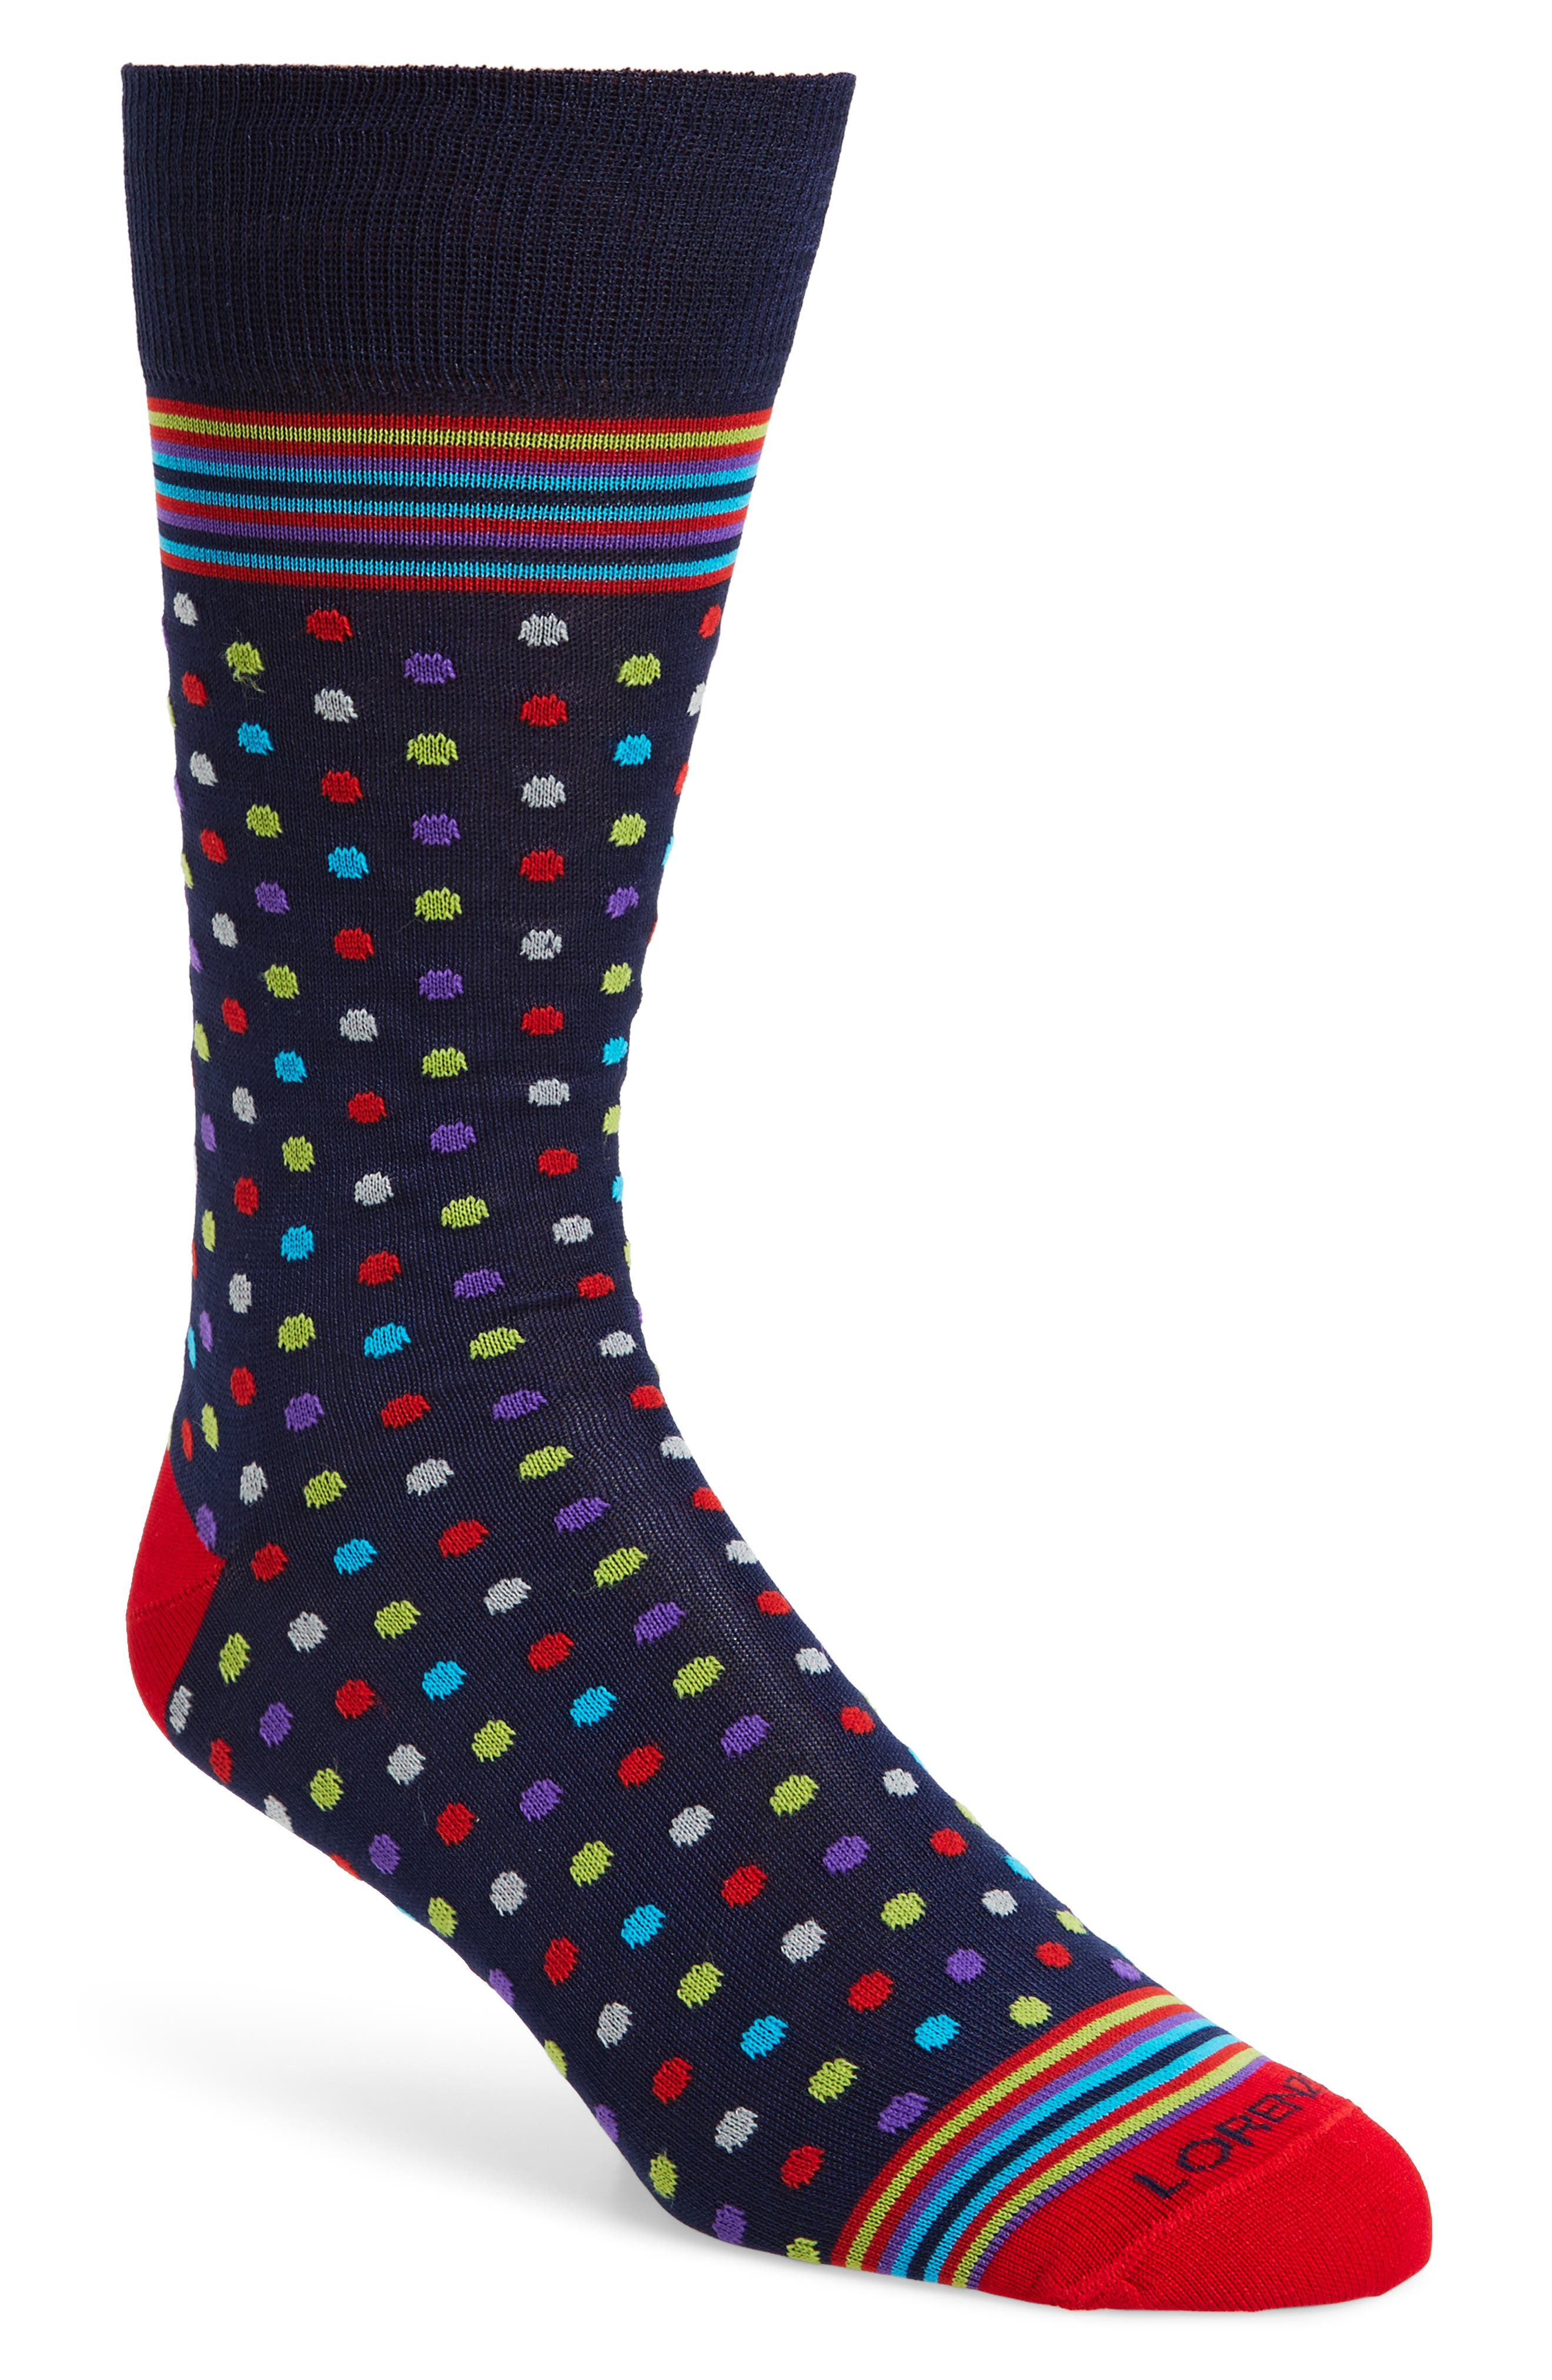 Lorenzo Uomo Dots and Stripes Socks (3 for $30)